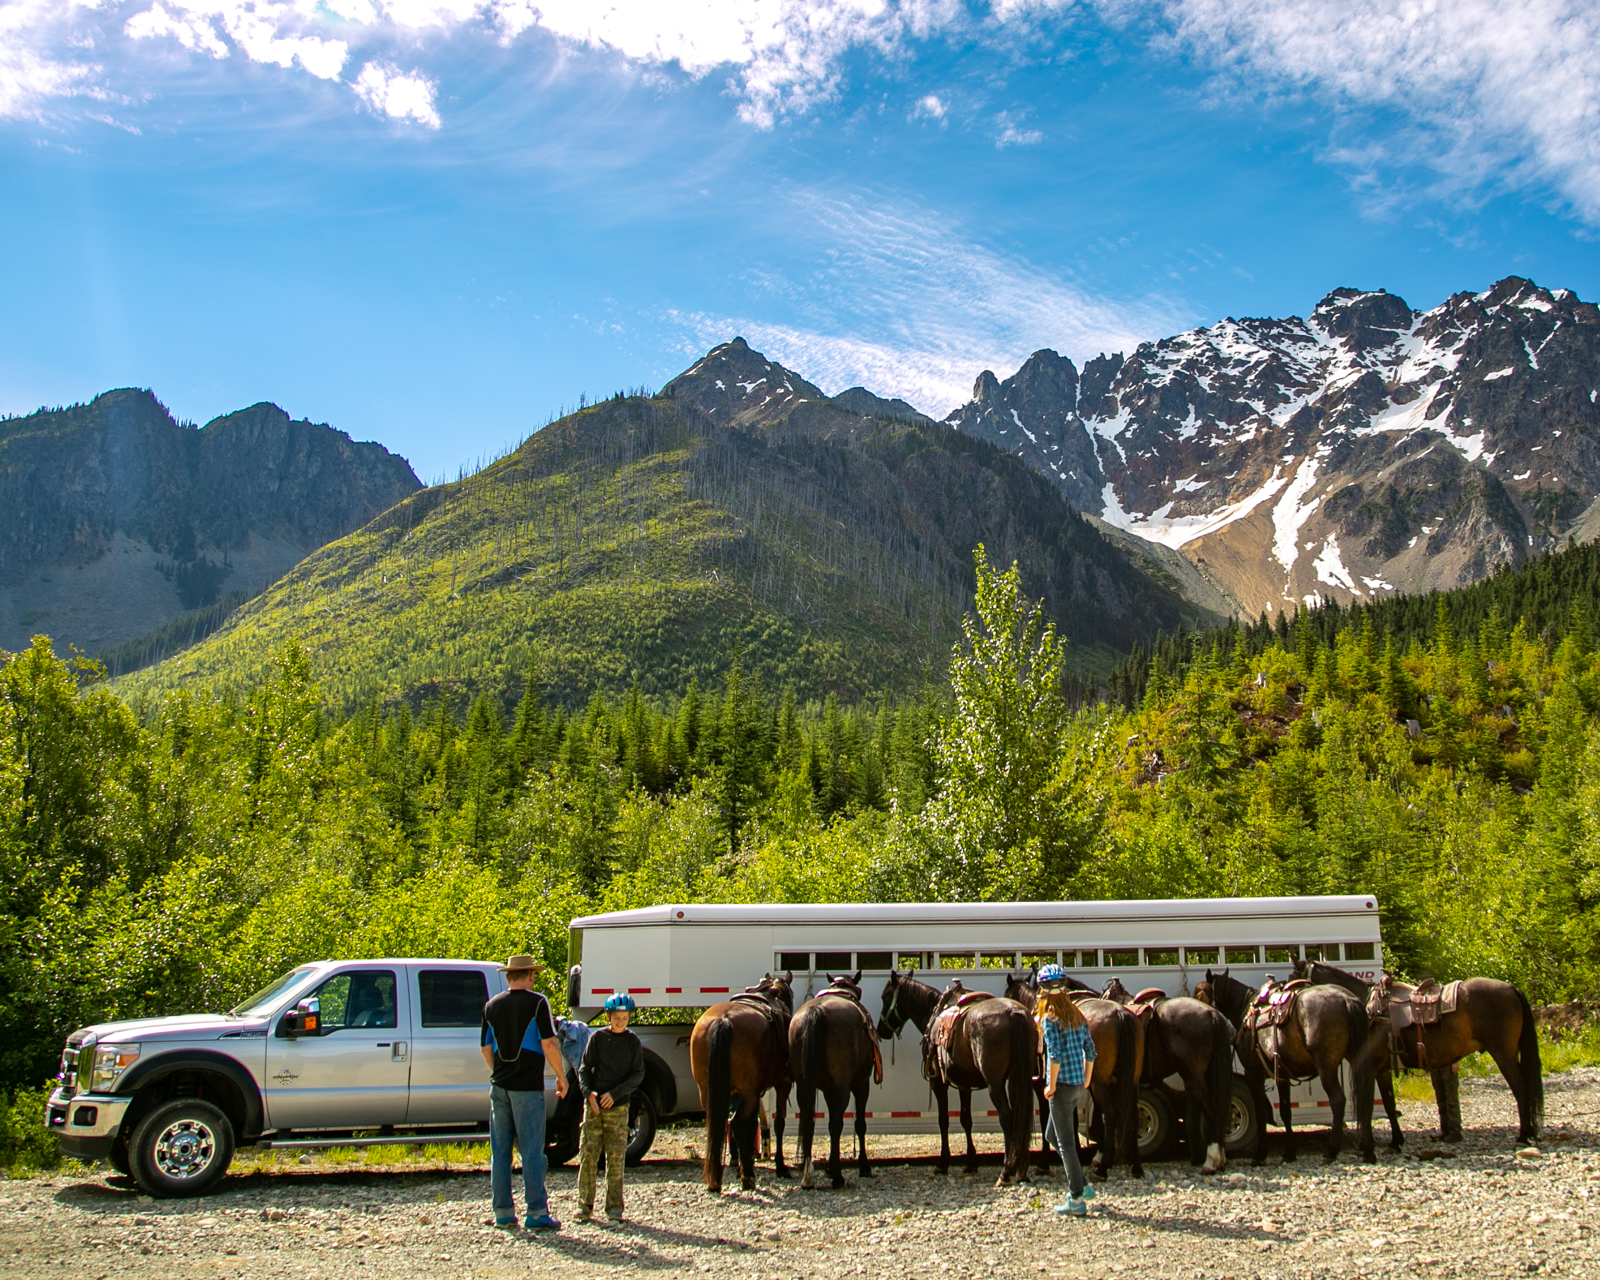 Li-lik-hel Gold Mine Horseback Riding Expedition in BC, Canada